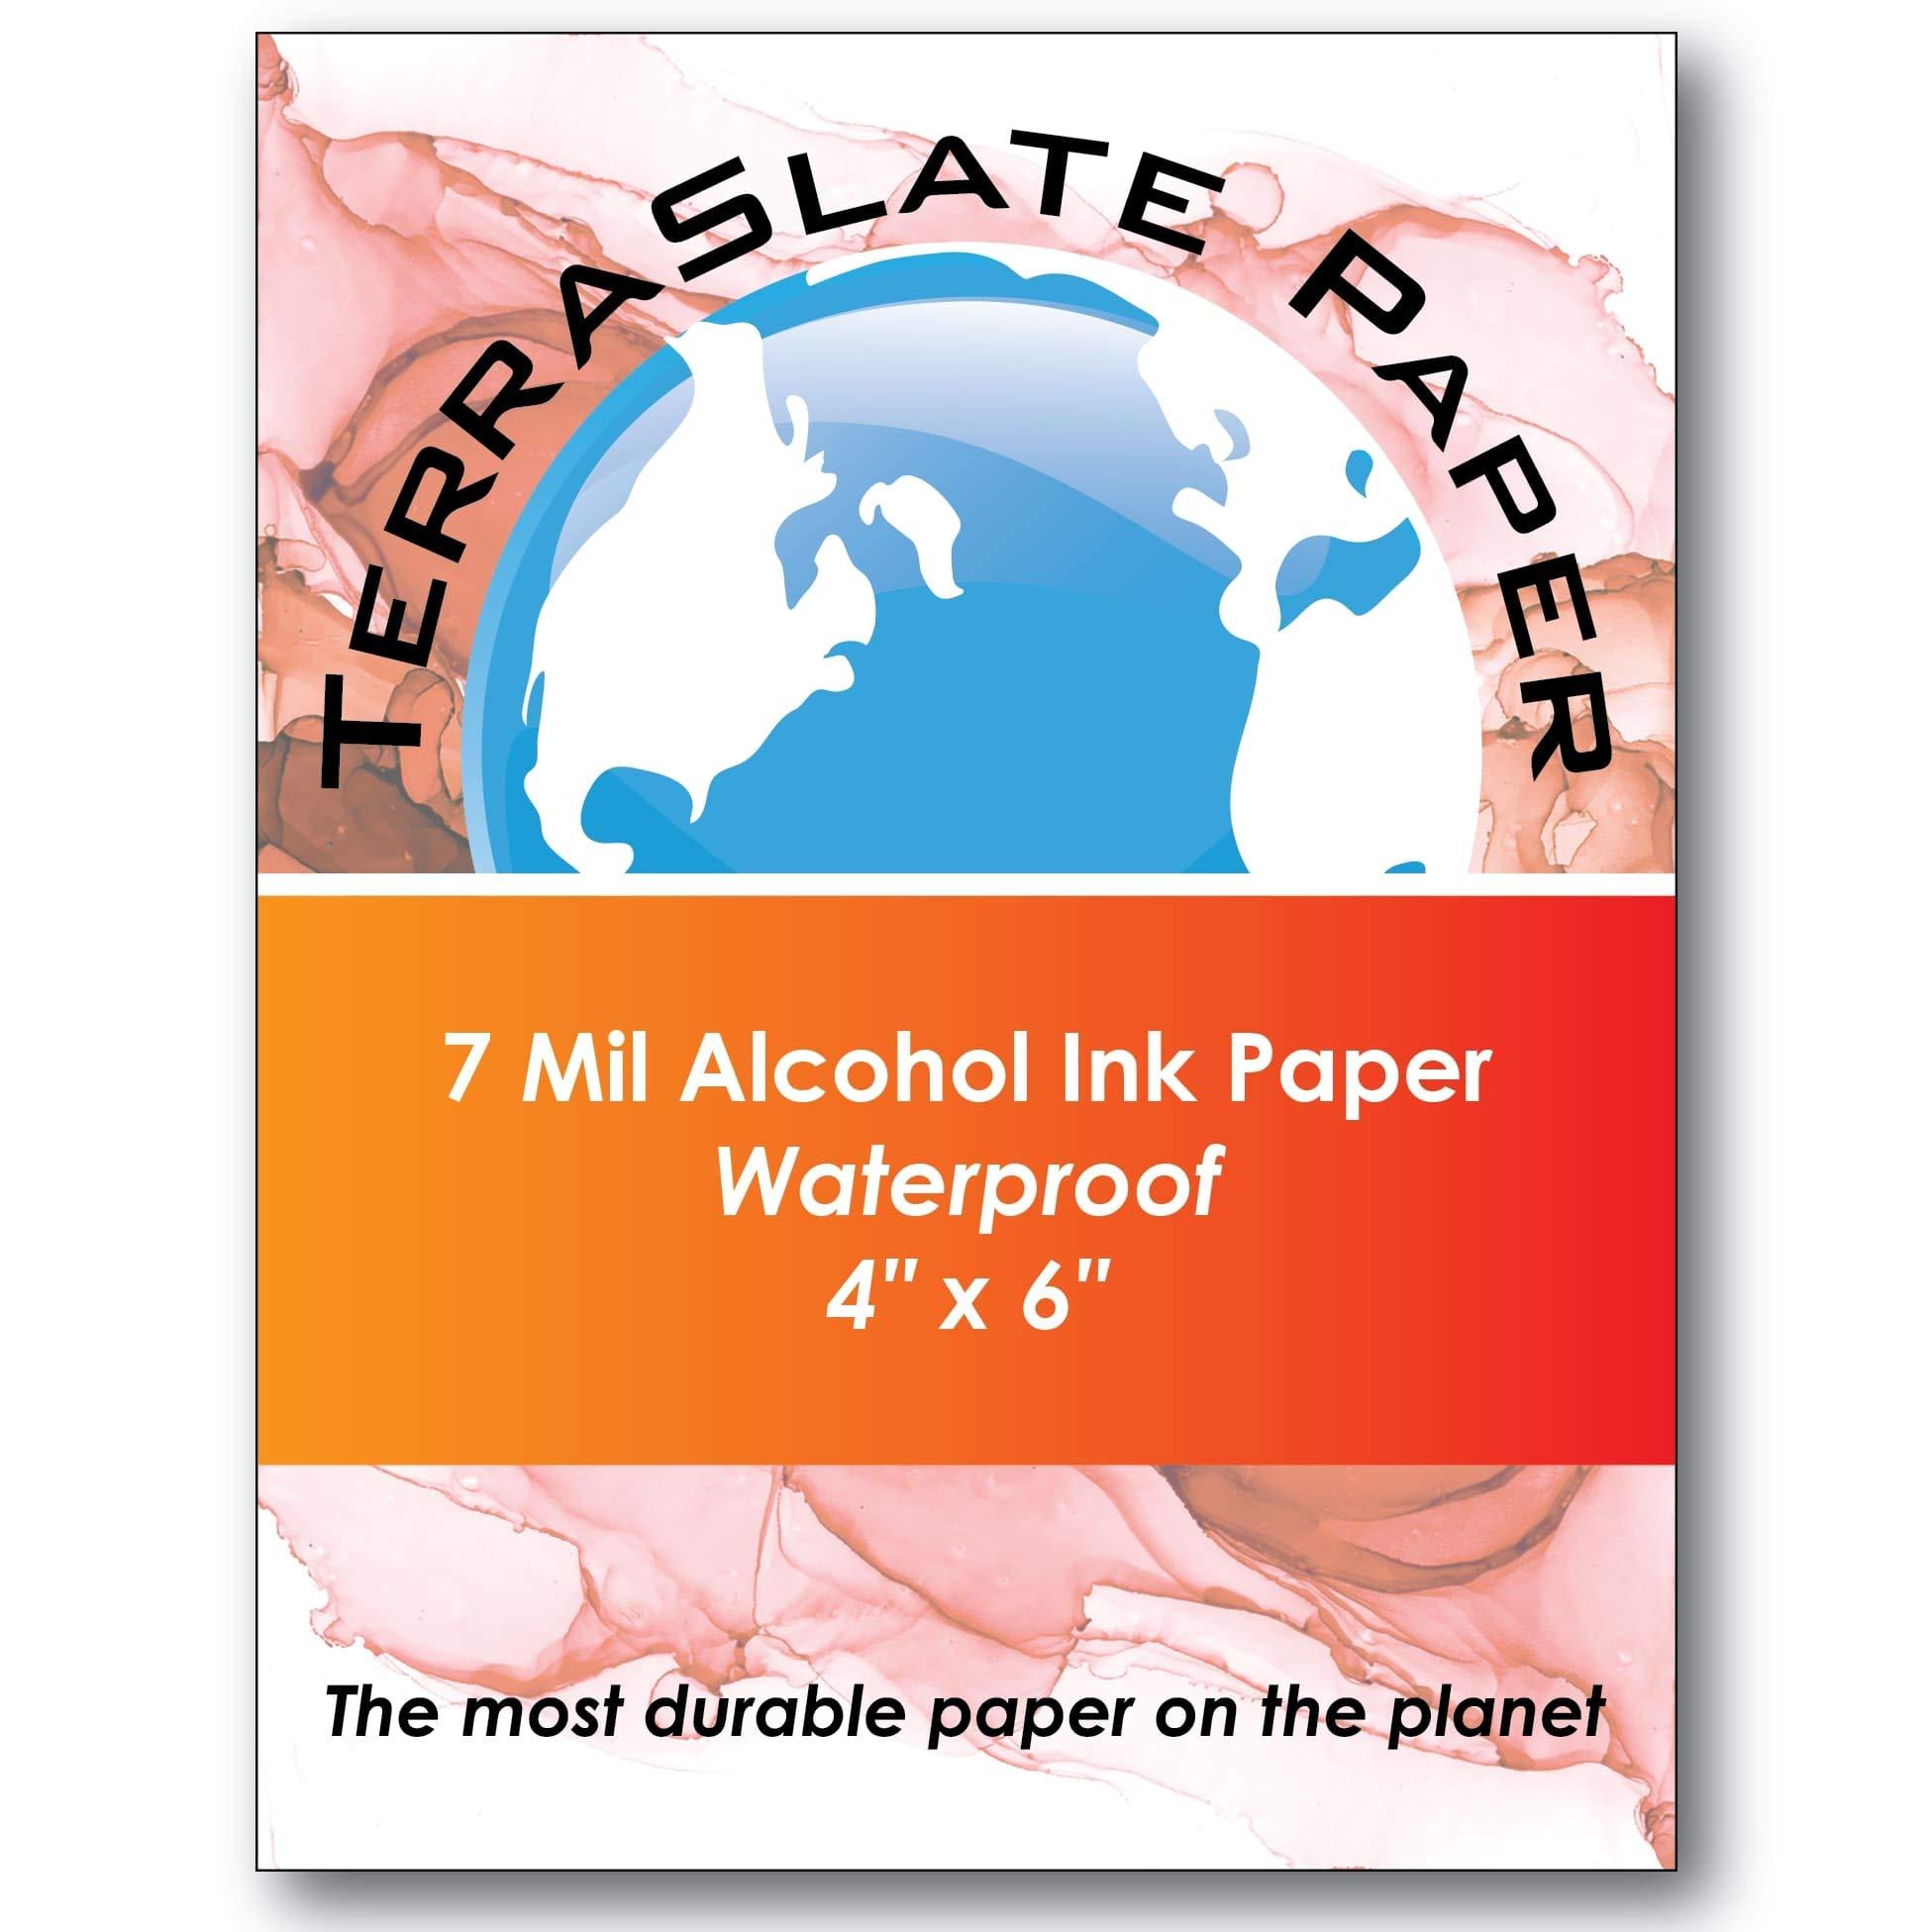 TerraSlate Paper 7 Mil 4'' x 6'' Alcohol Ink Art Paper 25 Sheets by TerraSlate